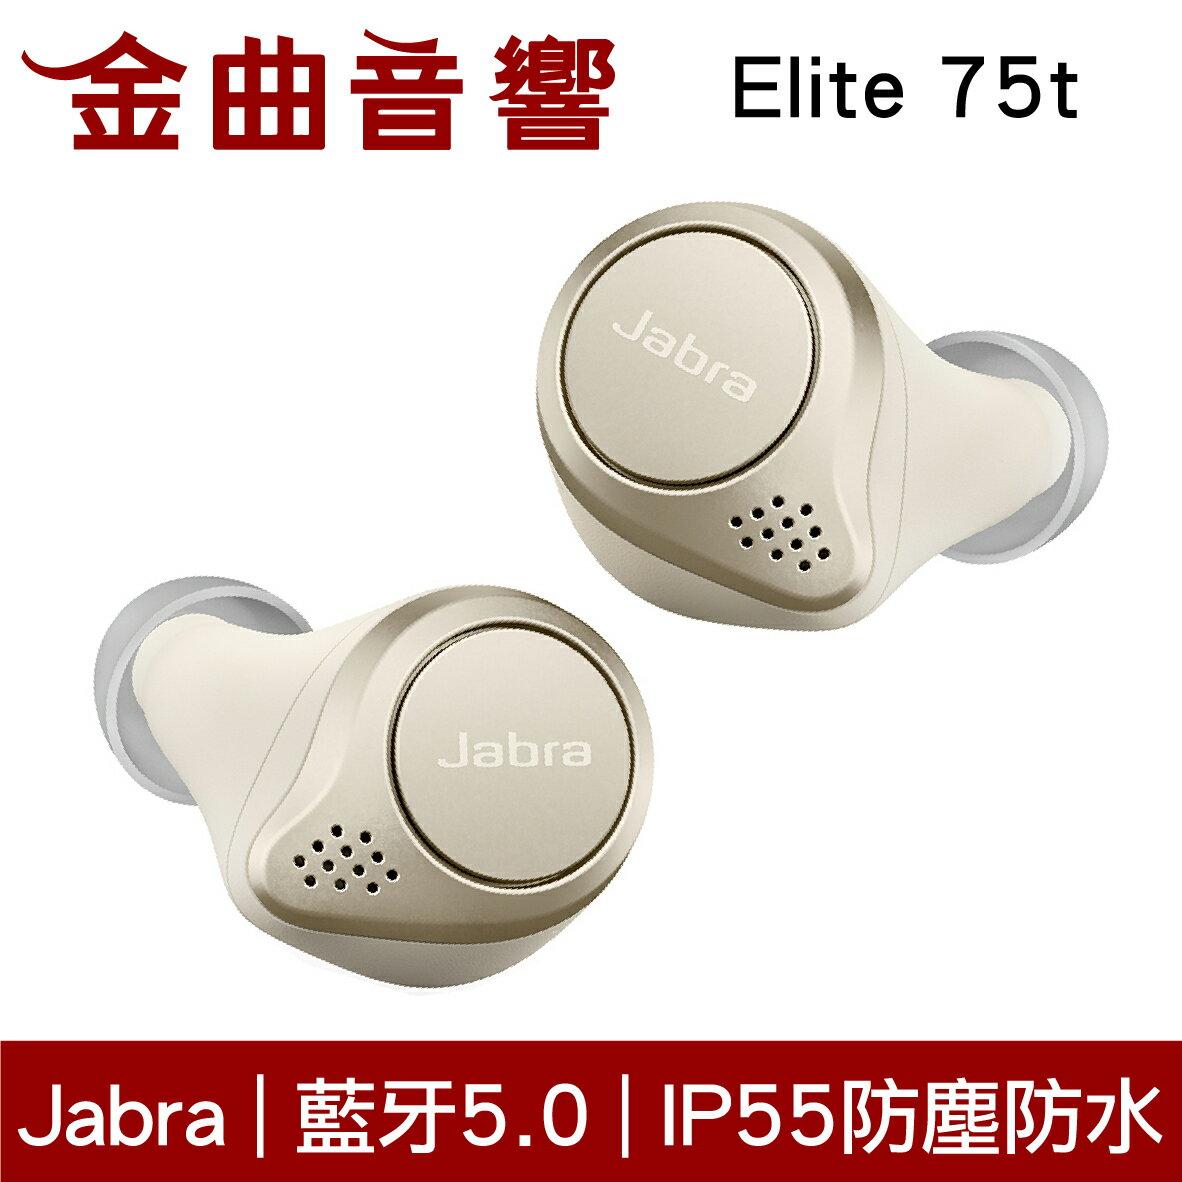 Jabra Elite 75t 鉑金米 真無線 藍芽耳機 | 金曲音響